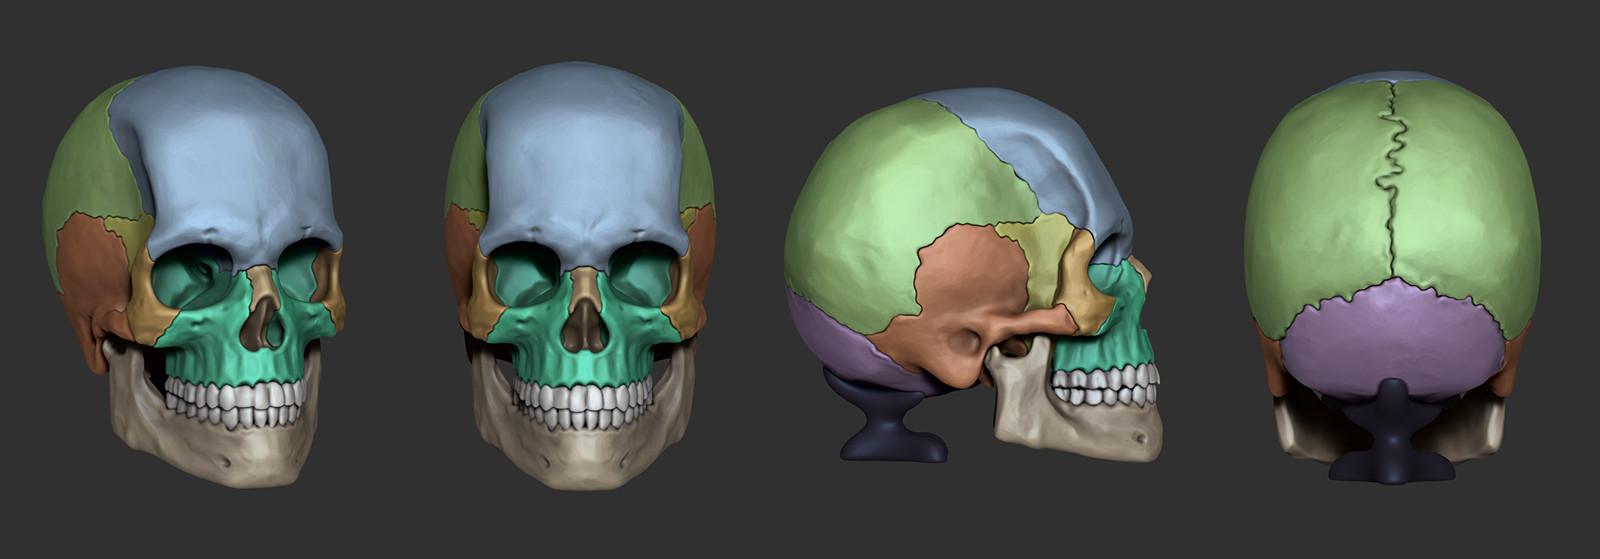 Hector moran skullscreenshots